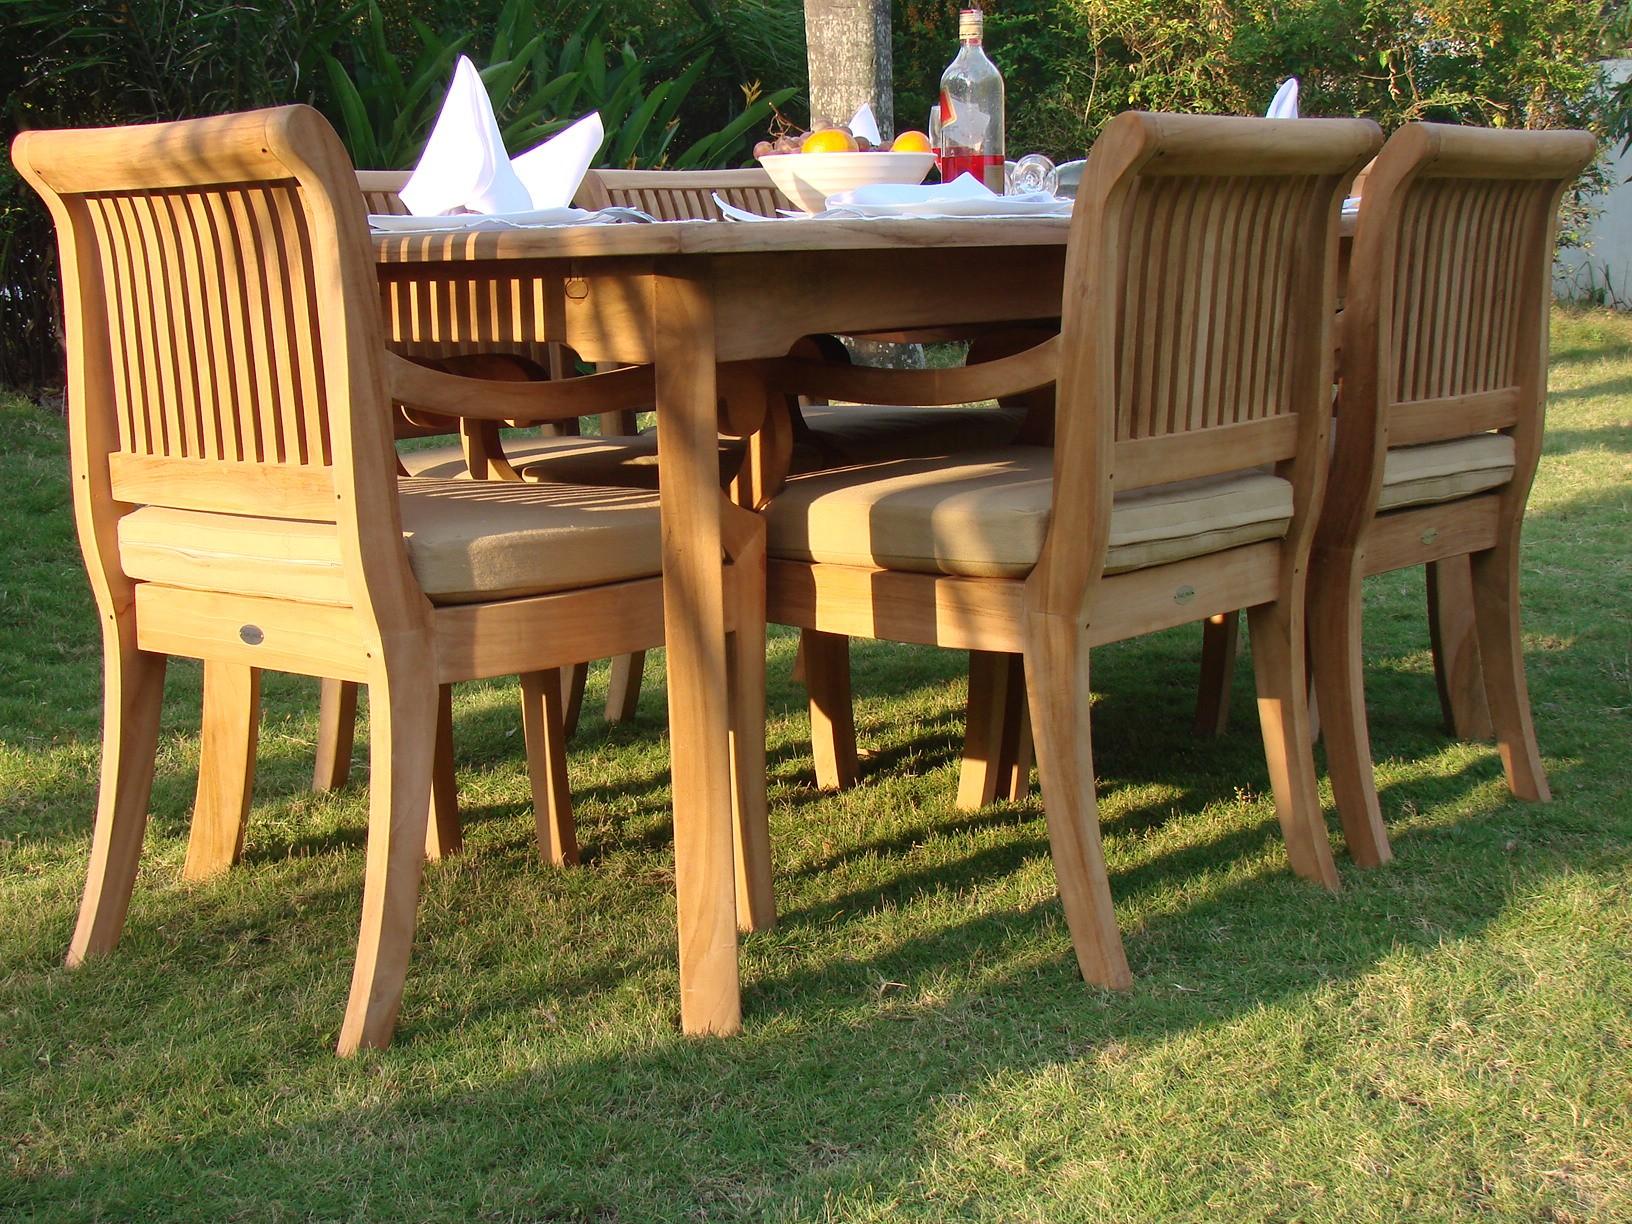 Teak Outdoor Patio Furniture